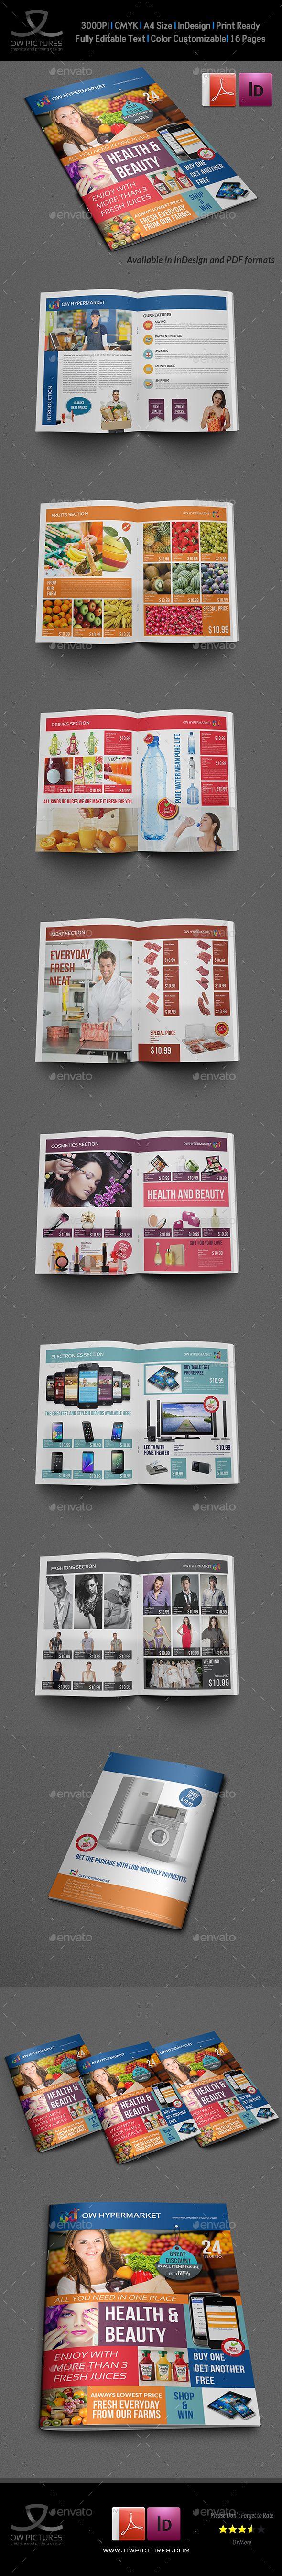 Supermarket Products Catalog Brochure Template InDesign INDD #design ...